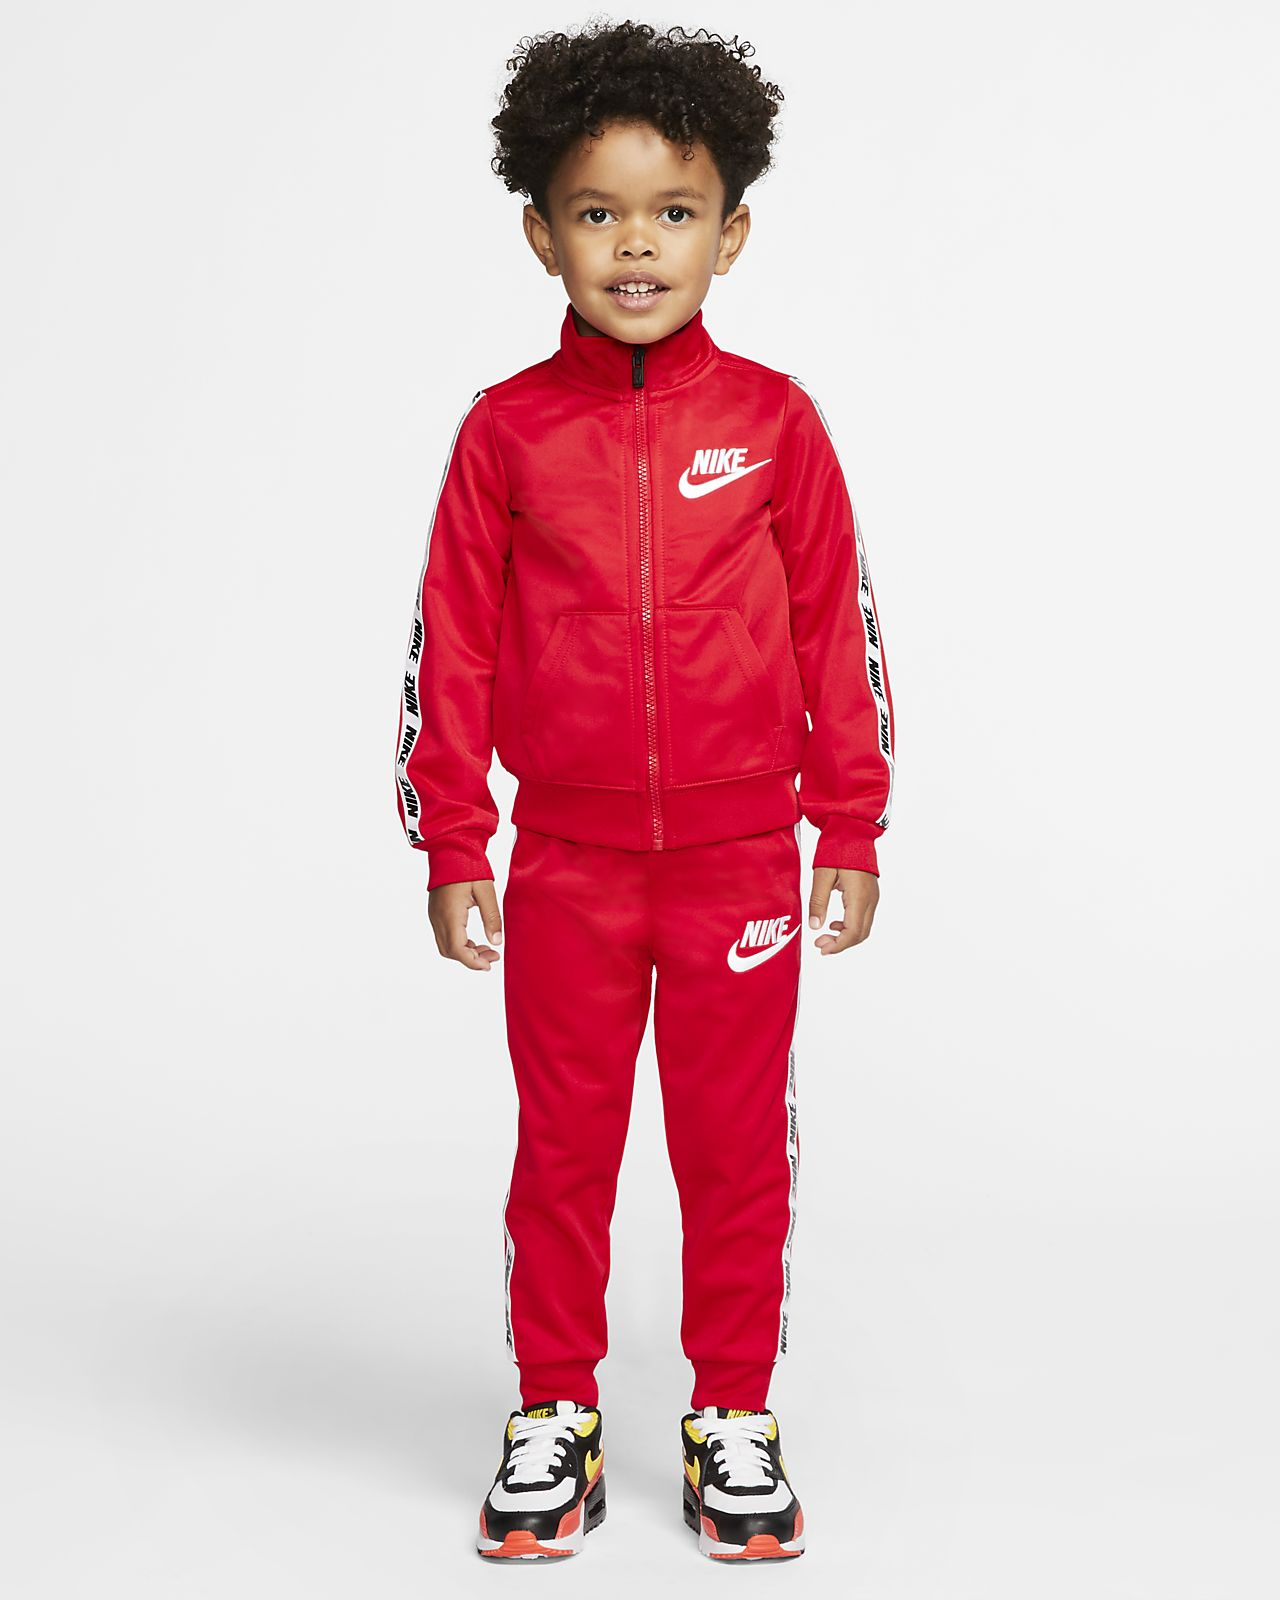 Dvoudílná souprava Nike pro batolata